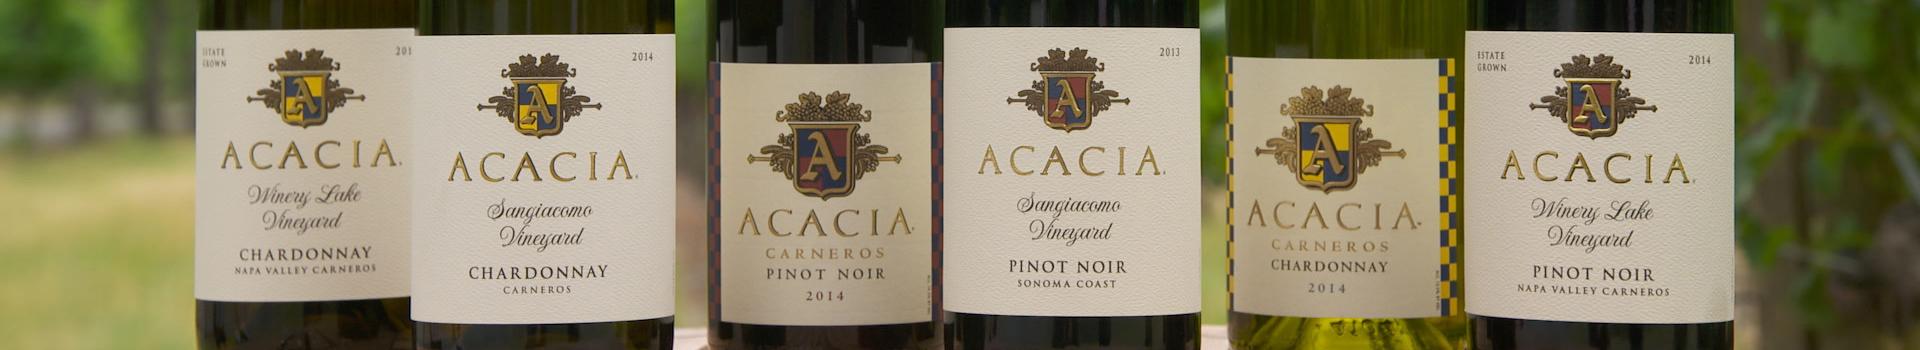 Acacia Wines